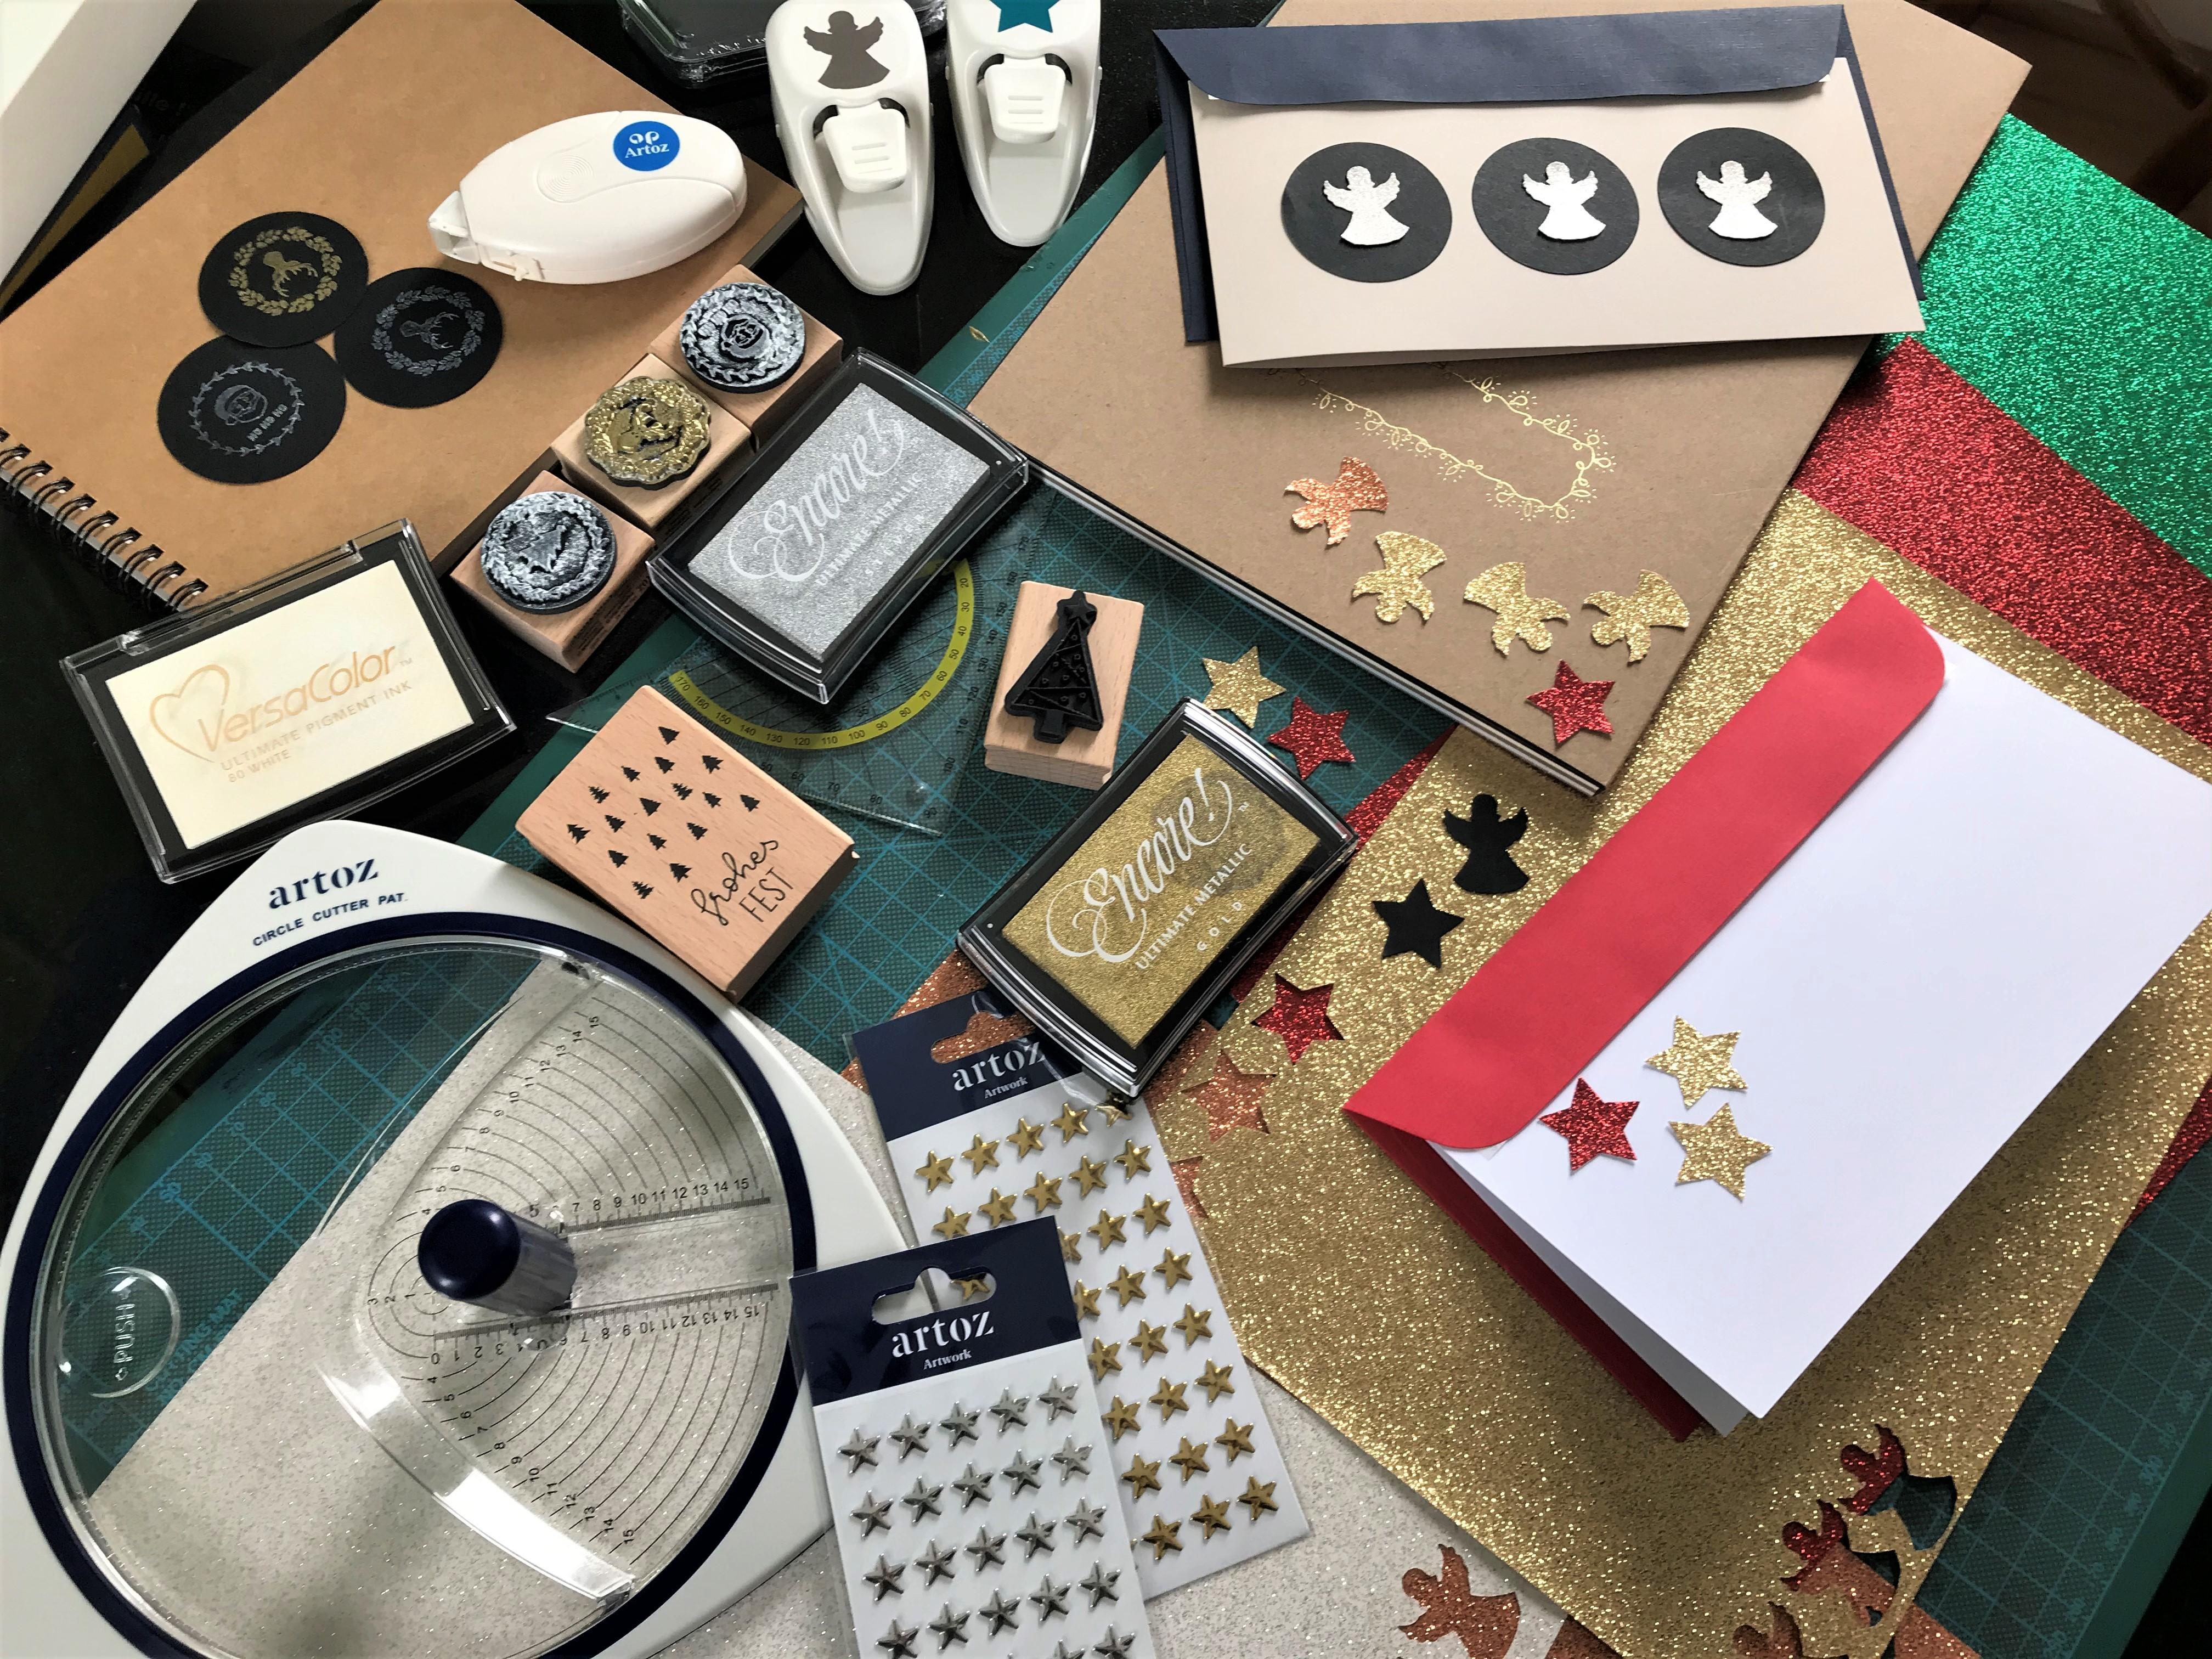 grusskarten-design_handmade_diy_Basteln_kreative-Weihnachtskarten_Kreativsortiment_arotz4Hv3cFkg3EdbP